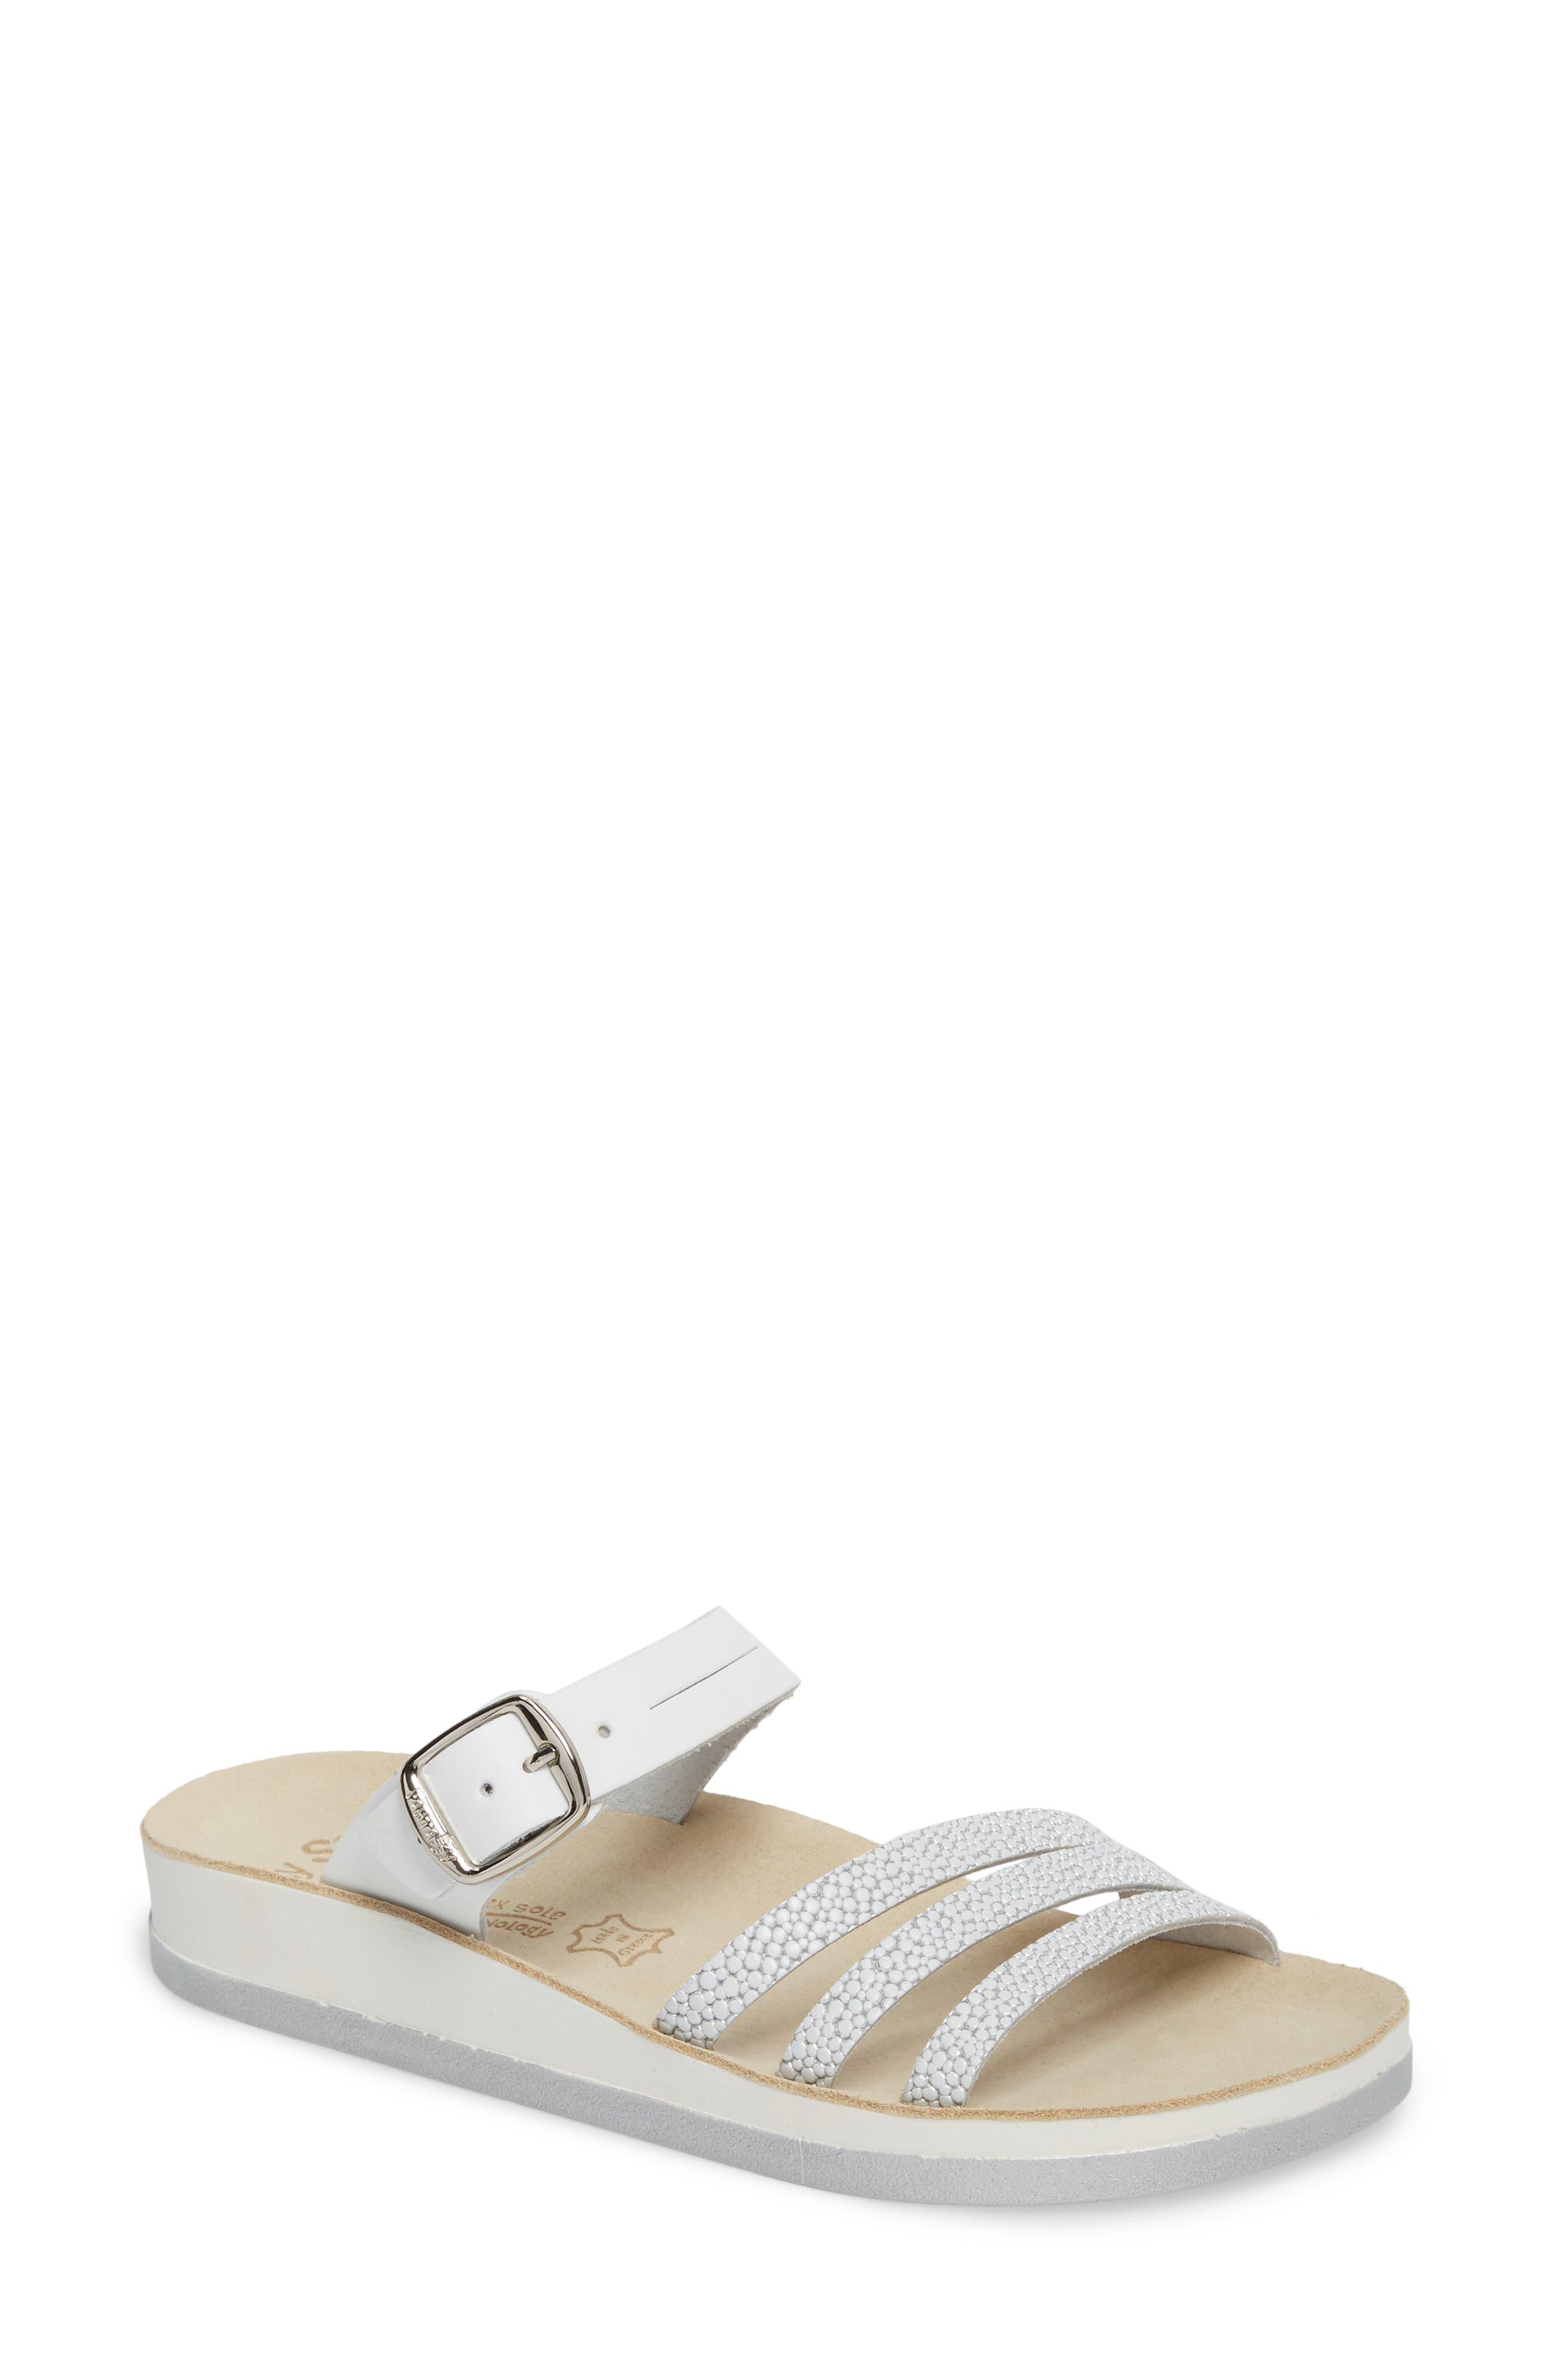 Lola Sandal,                         Main,                         color, White/ Silver Leather